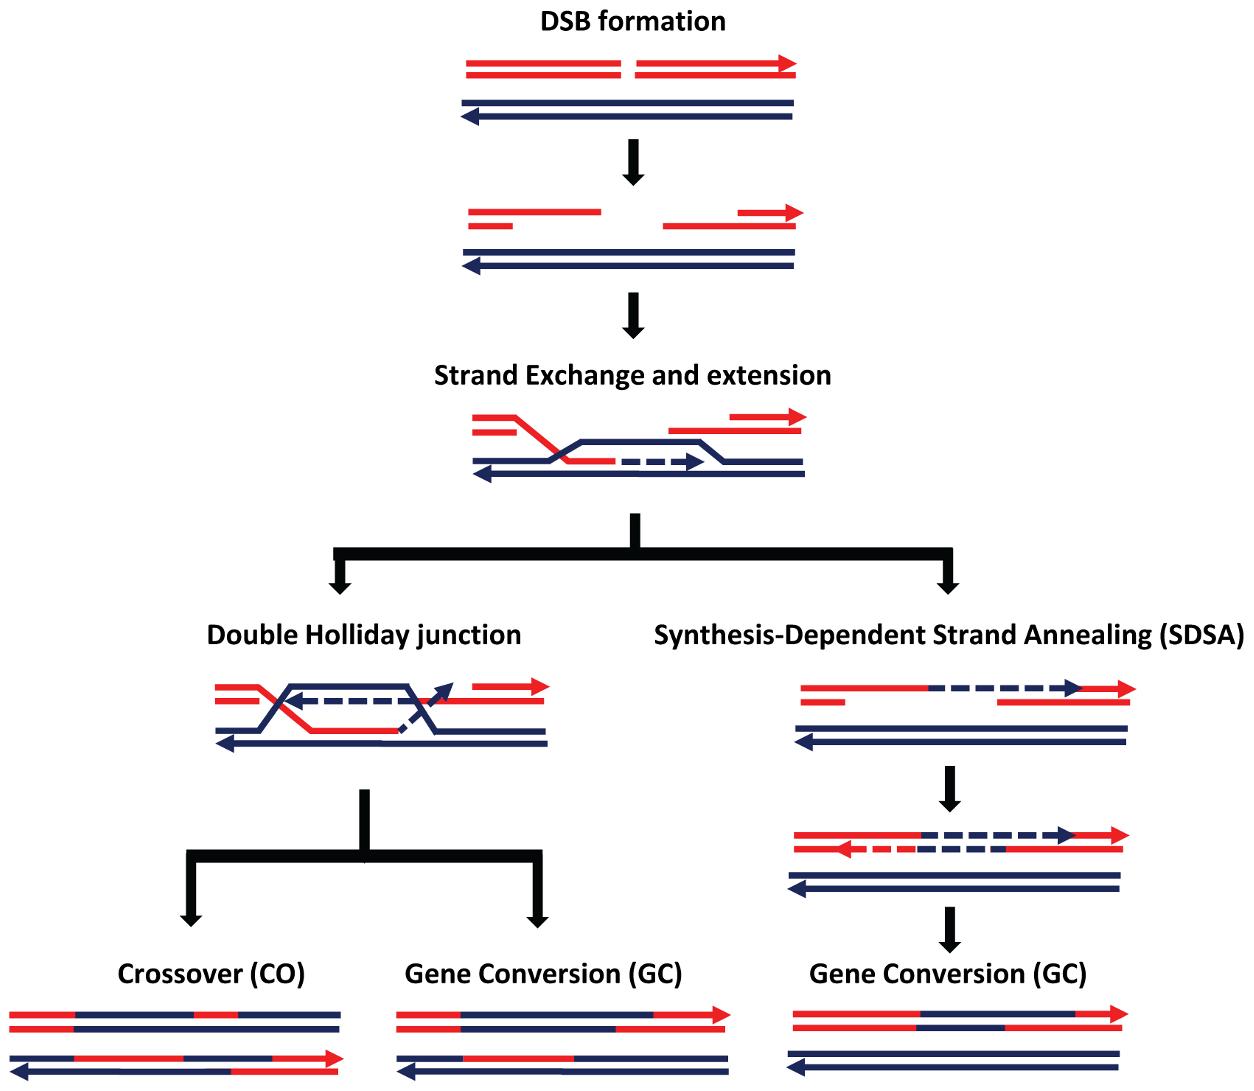 Schematic representation of the double-strand break (DSB) repair pathway and recombination from Comeron et al. <em class=&quot;ref&quot;>[<b>15</b>]</em>.